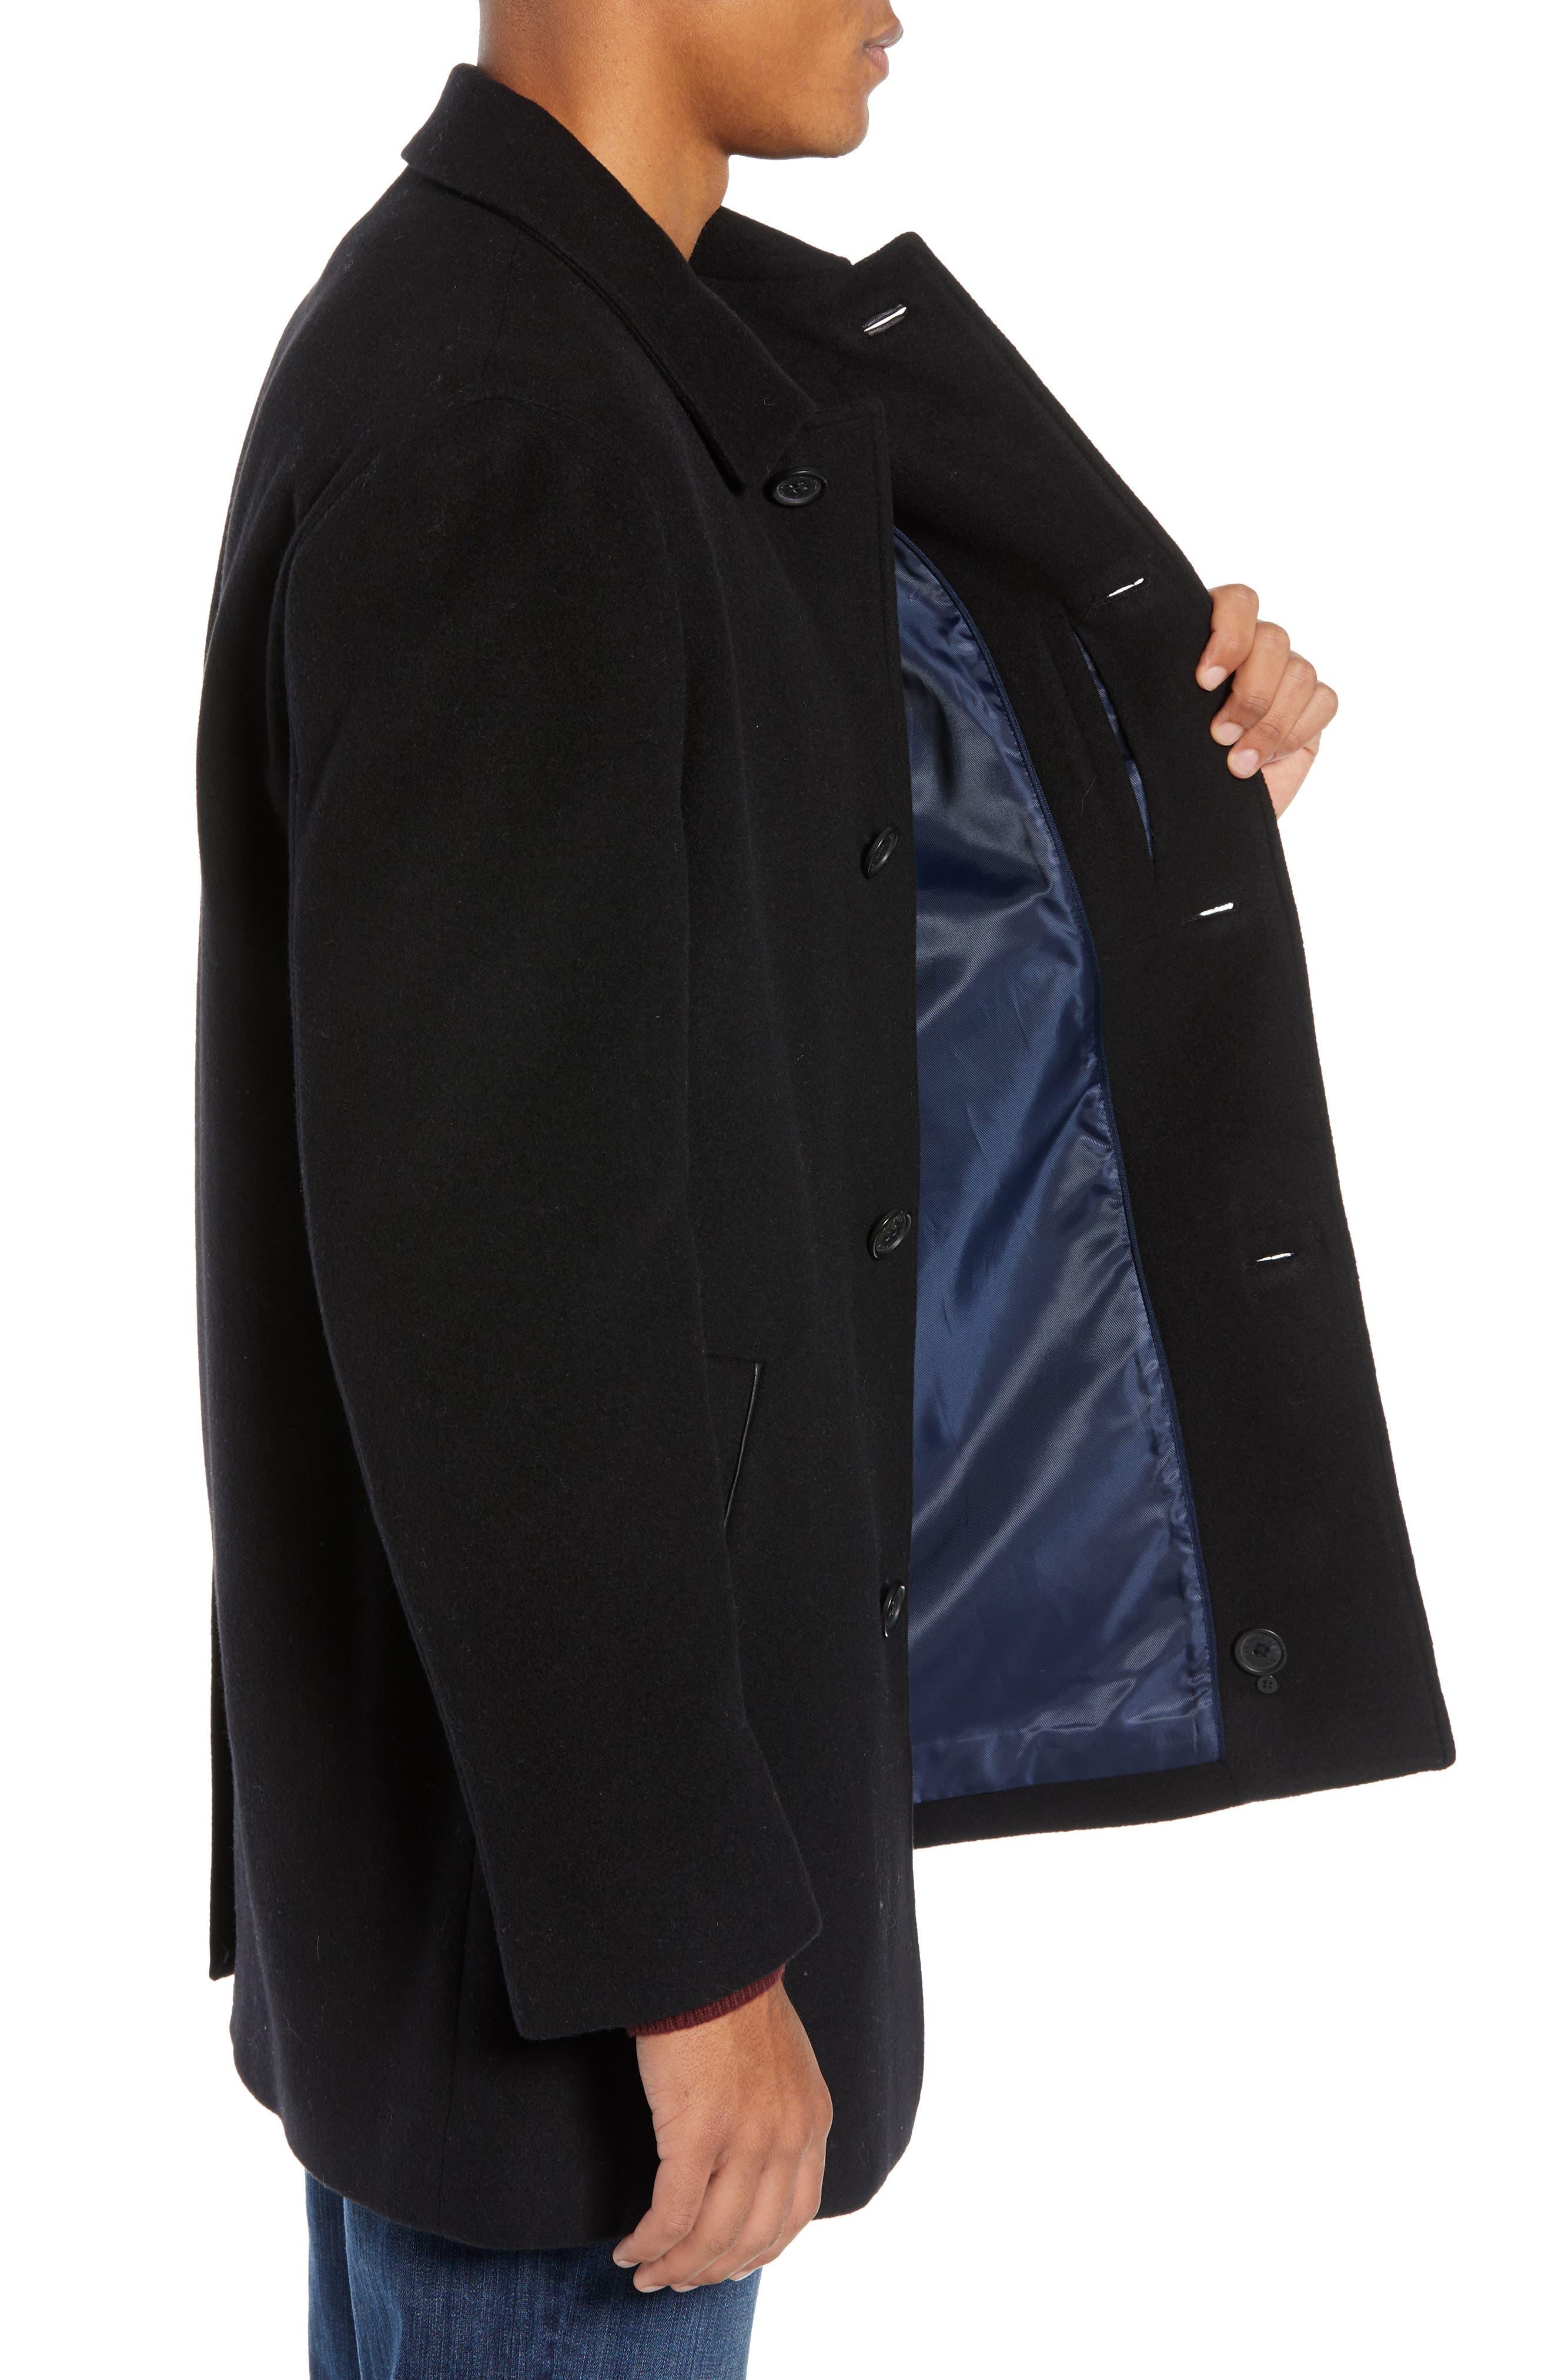 COLE HAAN, Italian Wool Blend Overcoat, Alternate thumbnail 4, color, 001